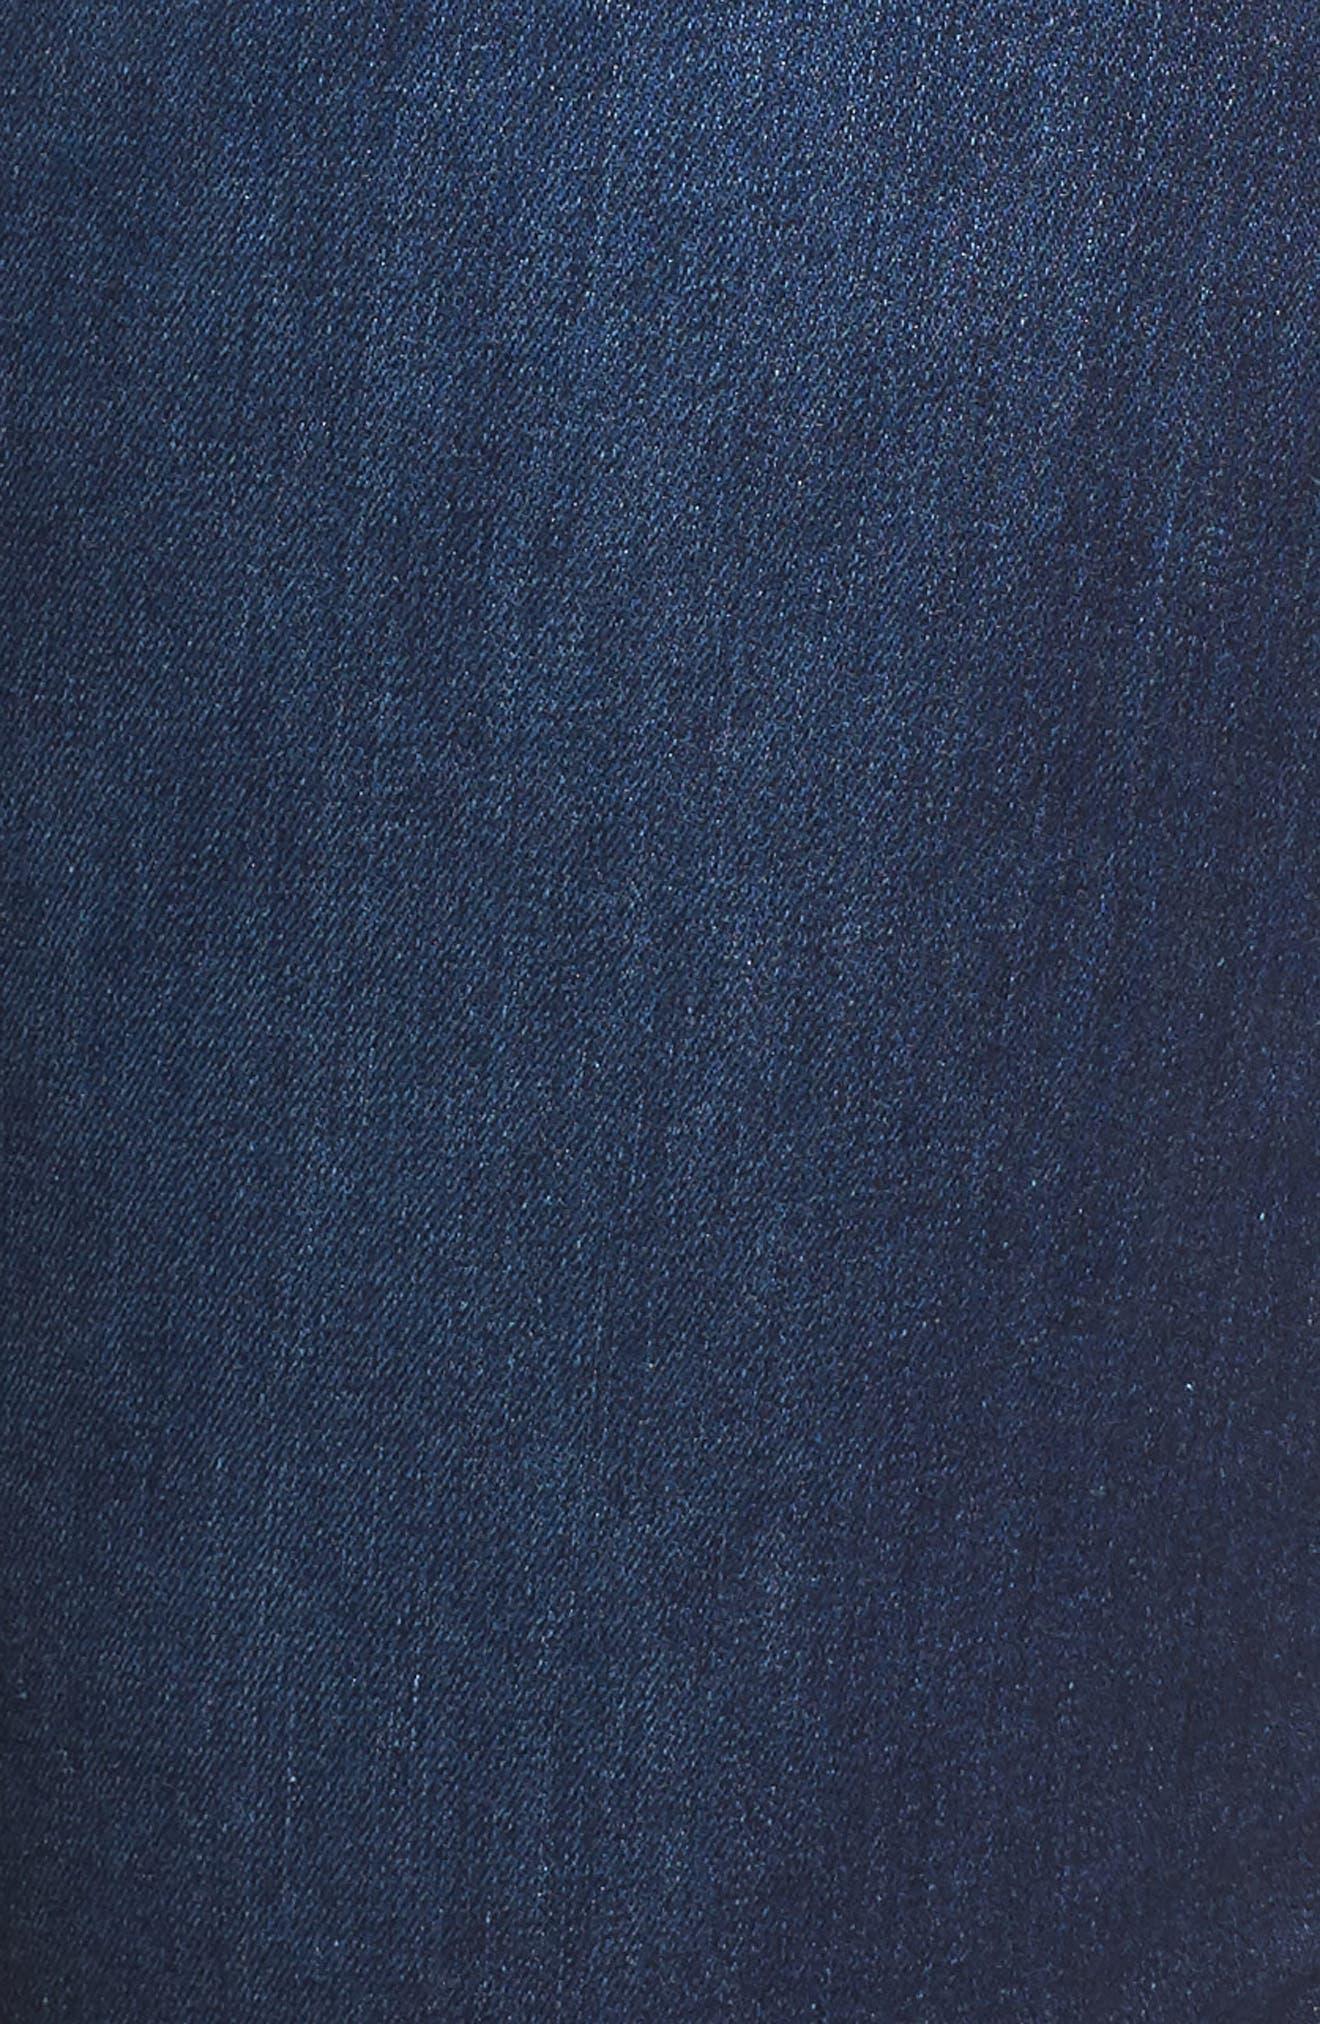 Briella Fray Hem Denim Bermuda Shorts,                             Alternate thumbnail 7, color,                             Cooper